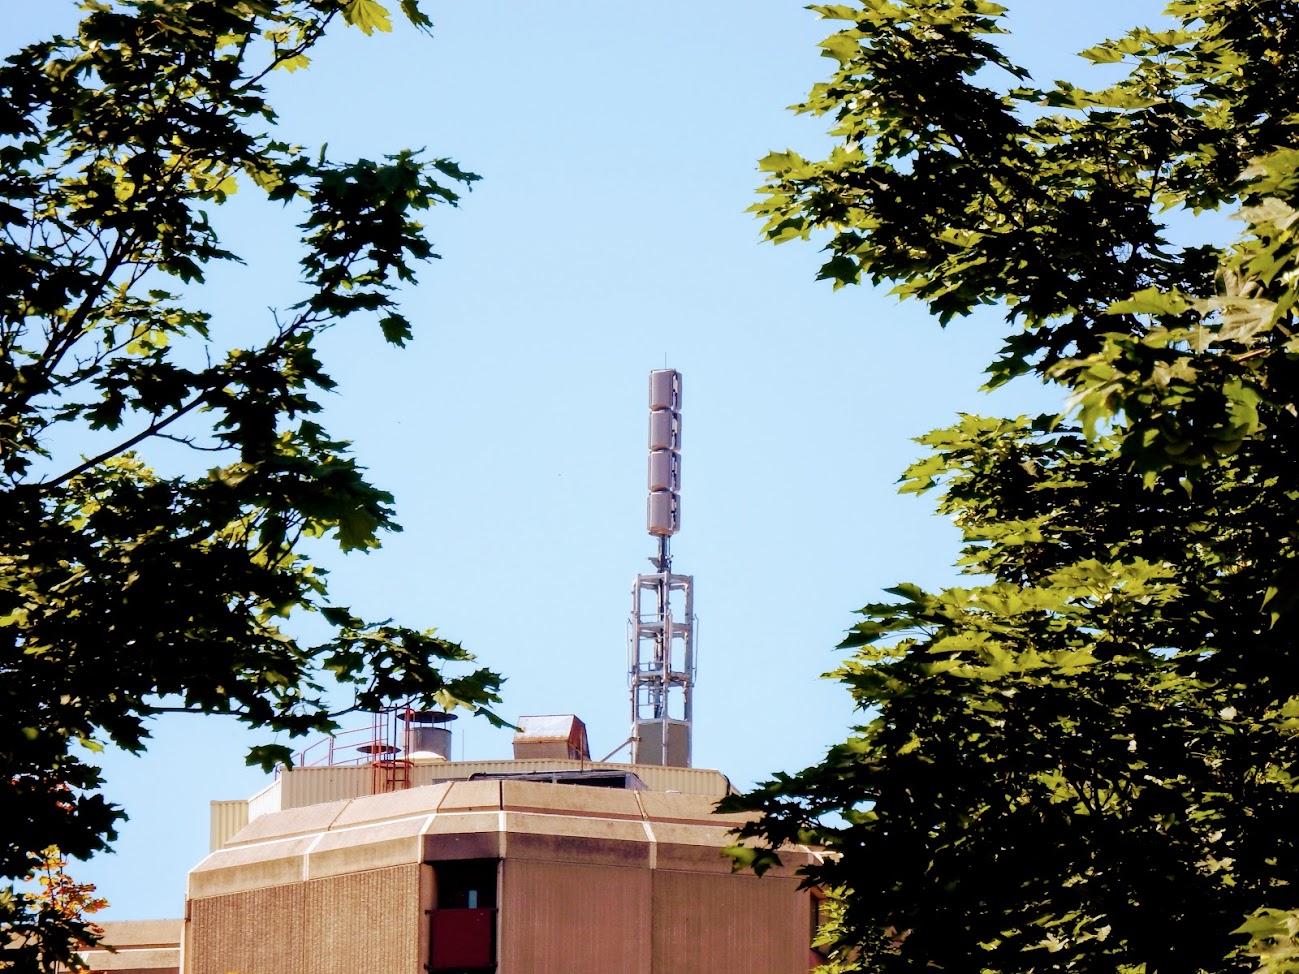 Wien 7/Mariahilfer Gürtel - DVB-T2 gapfiller